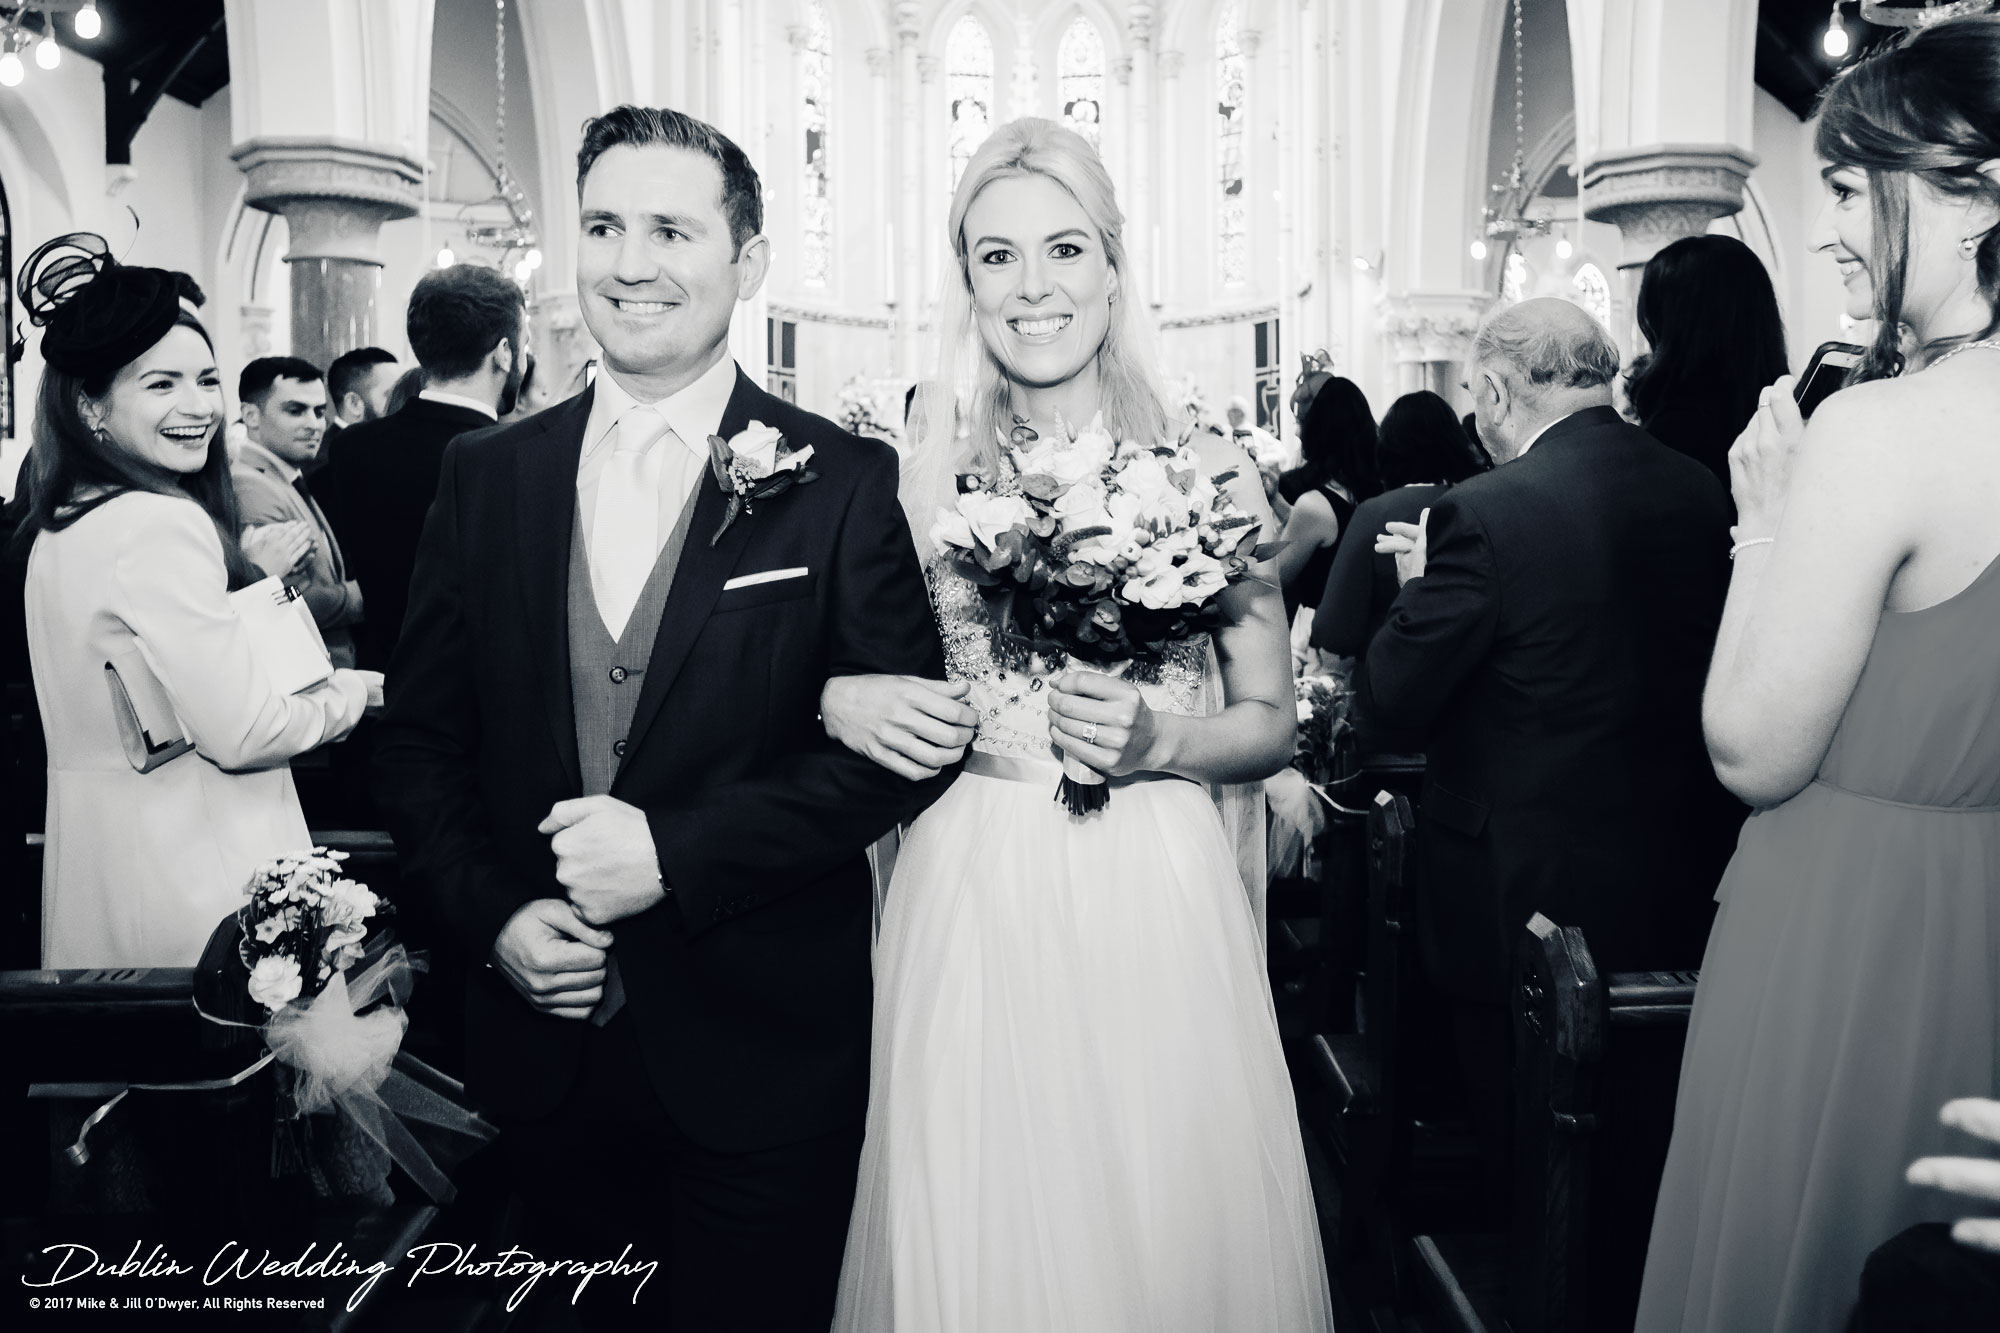 K Club, Kildare, Wedding Photographer, Dublin, Bride and Groom walking down the aisle together